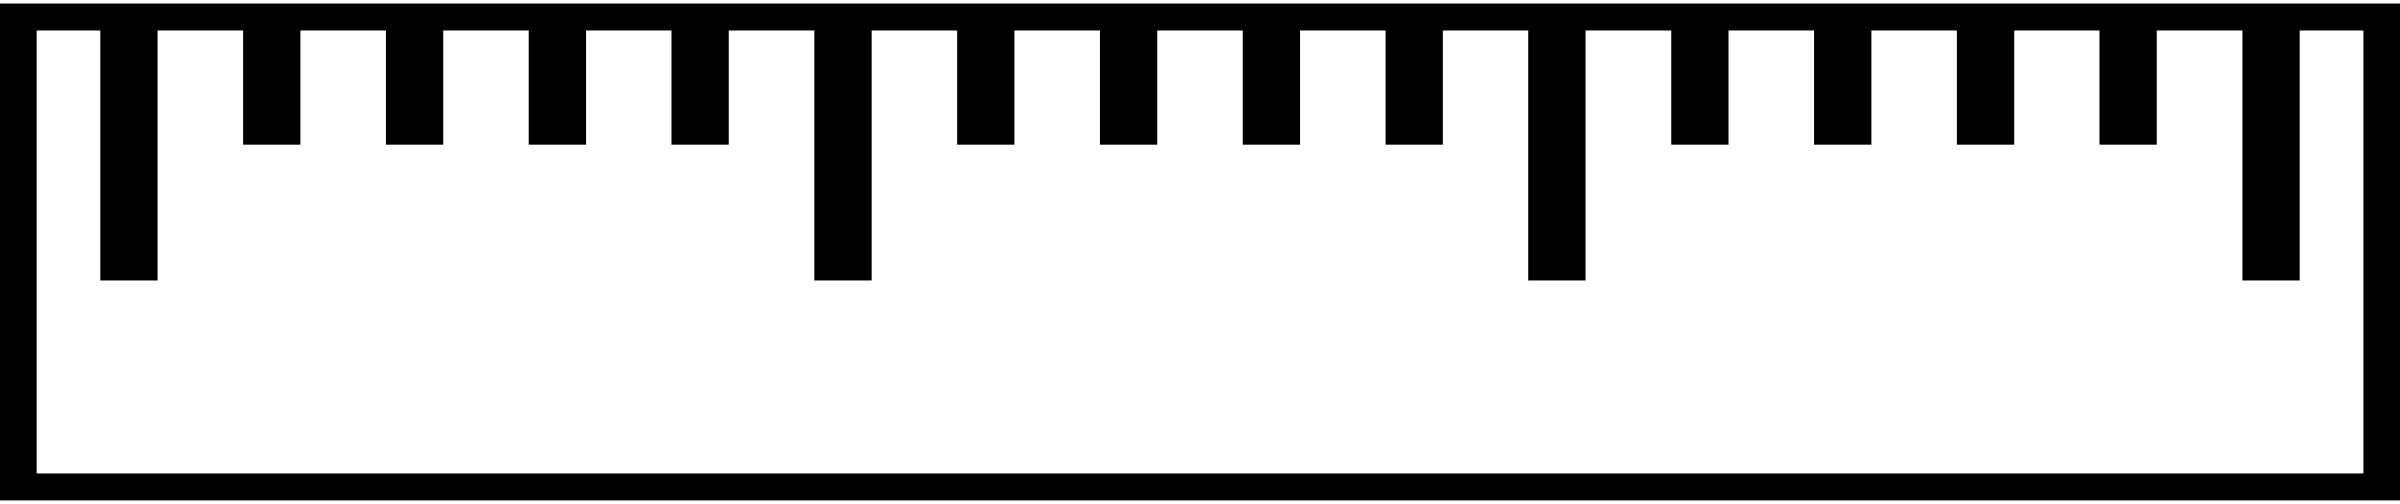 2400x504 Inch Ruler Clipart